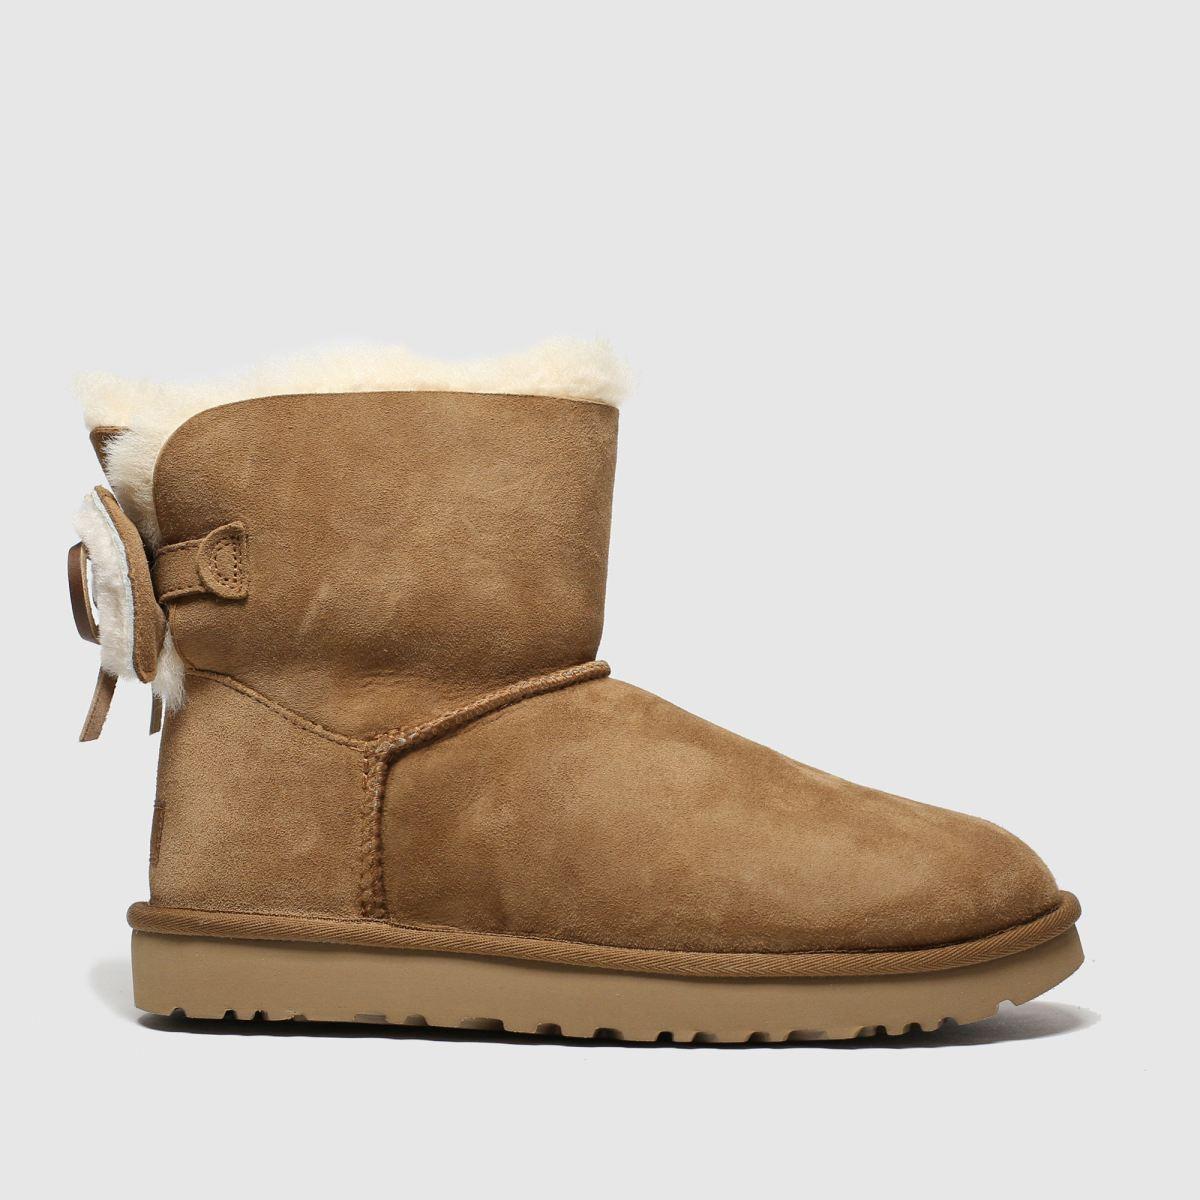 Ugg Tan Classic Double Bow Mini Boots